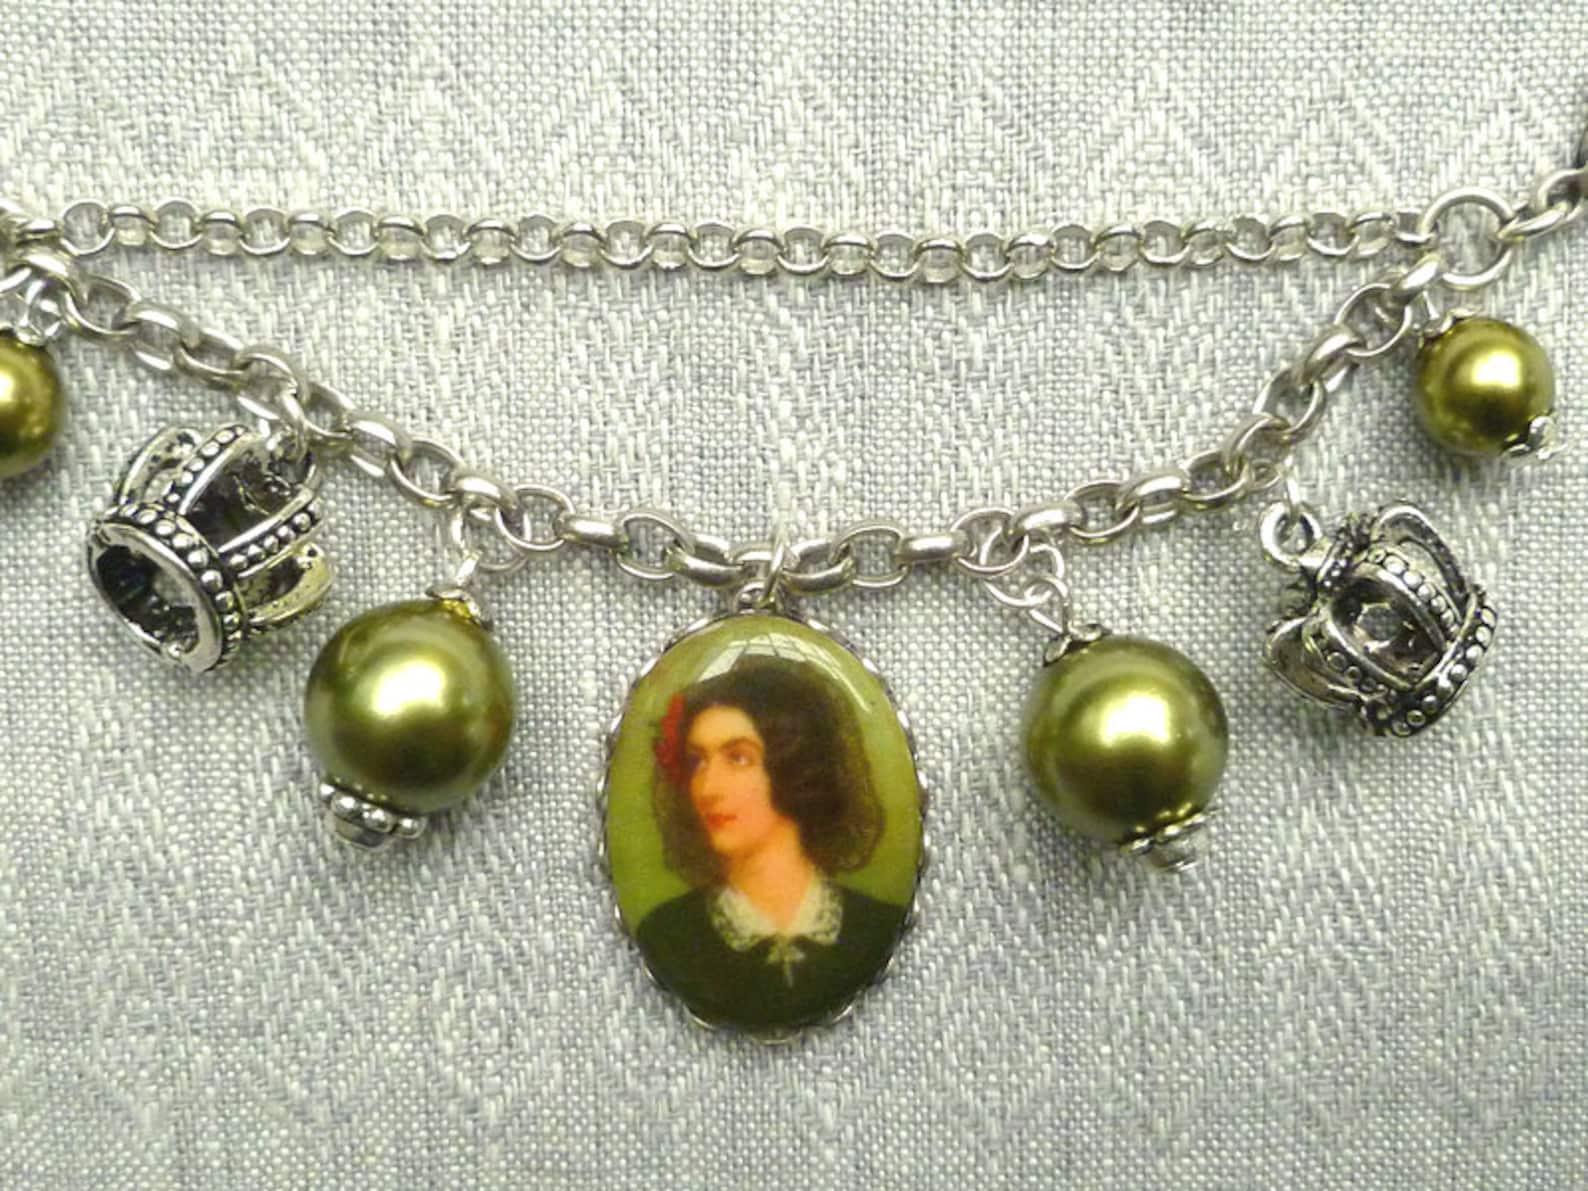 Dirndl chain, Charivari, Bavarian jewellry, 12 cm, antiqued silver colored, glass pearls, rosè, portrait of Munich girl, Dirndl, Octoberfest